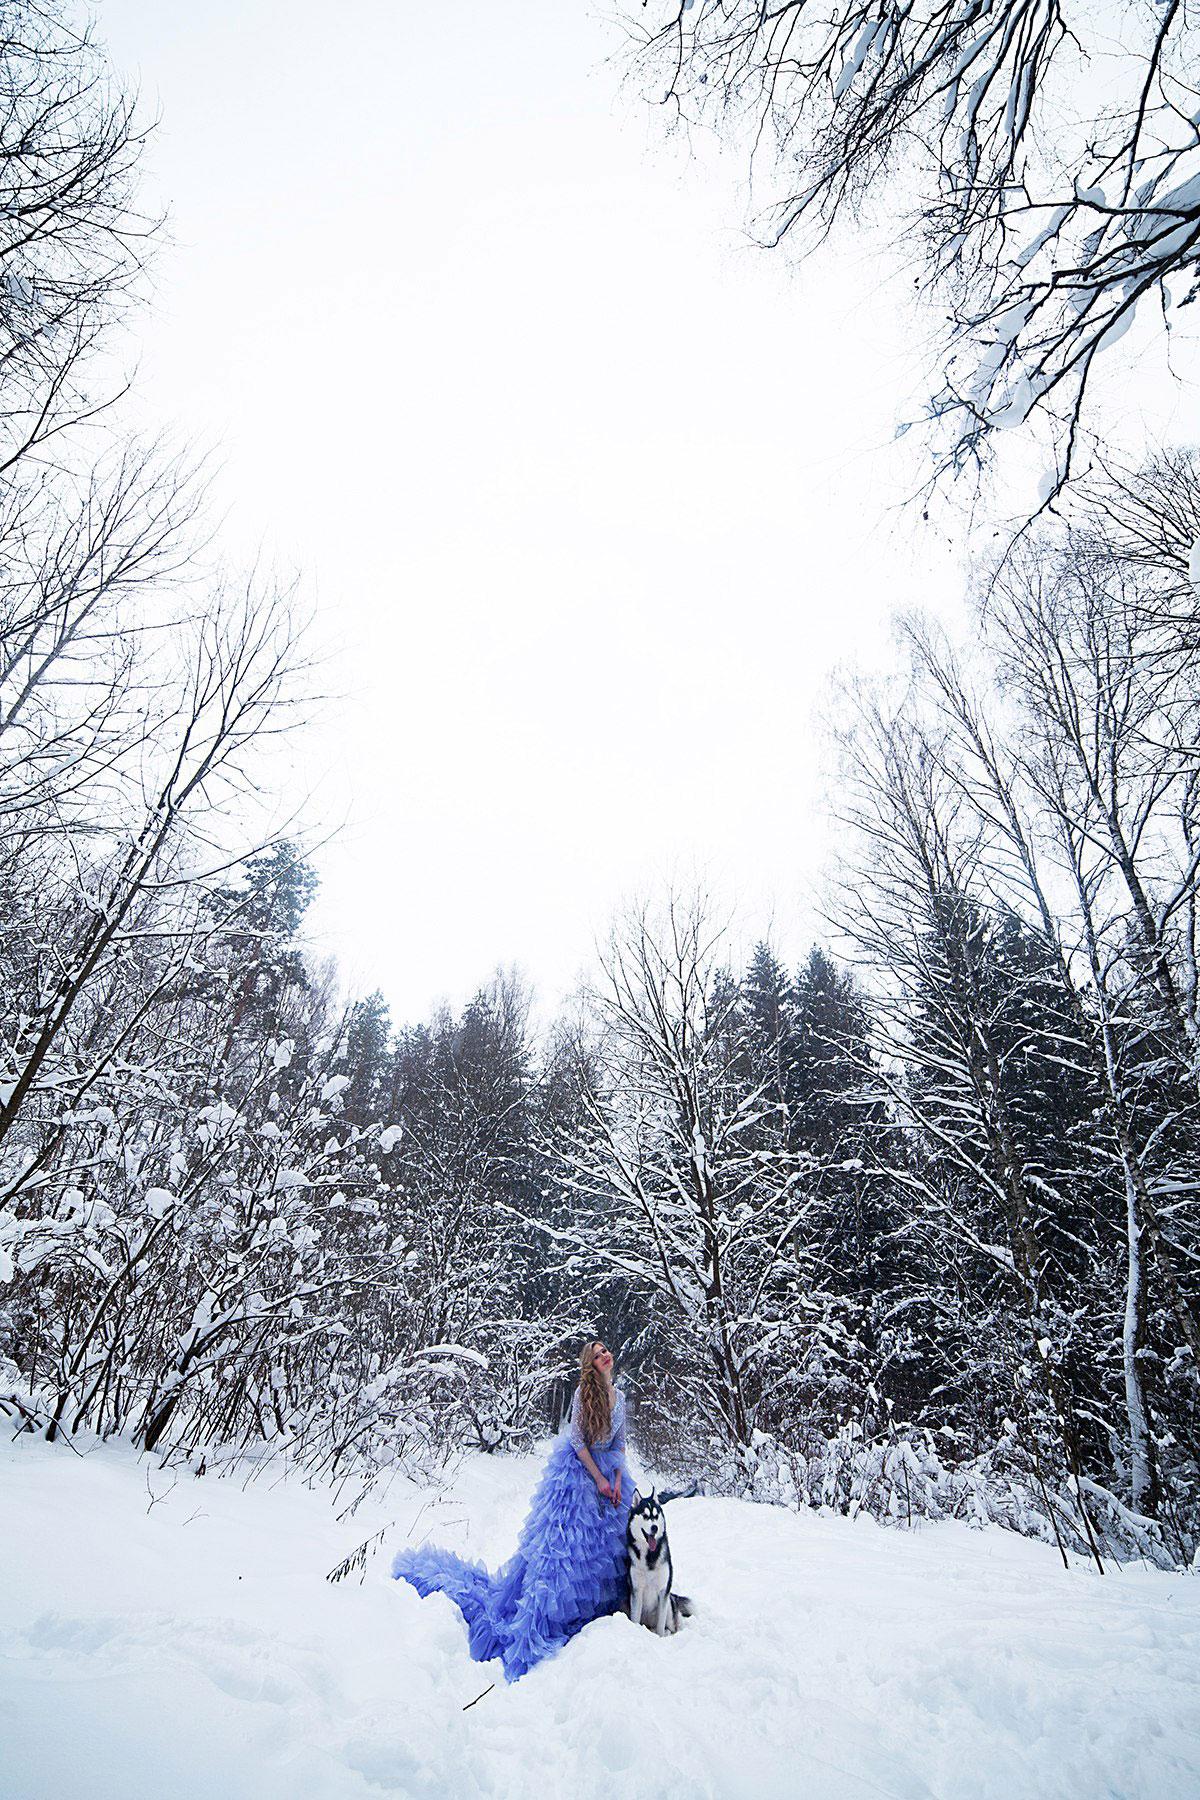 Зимняя фотосессия в лесу с хаски